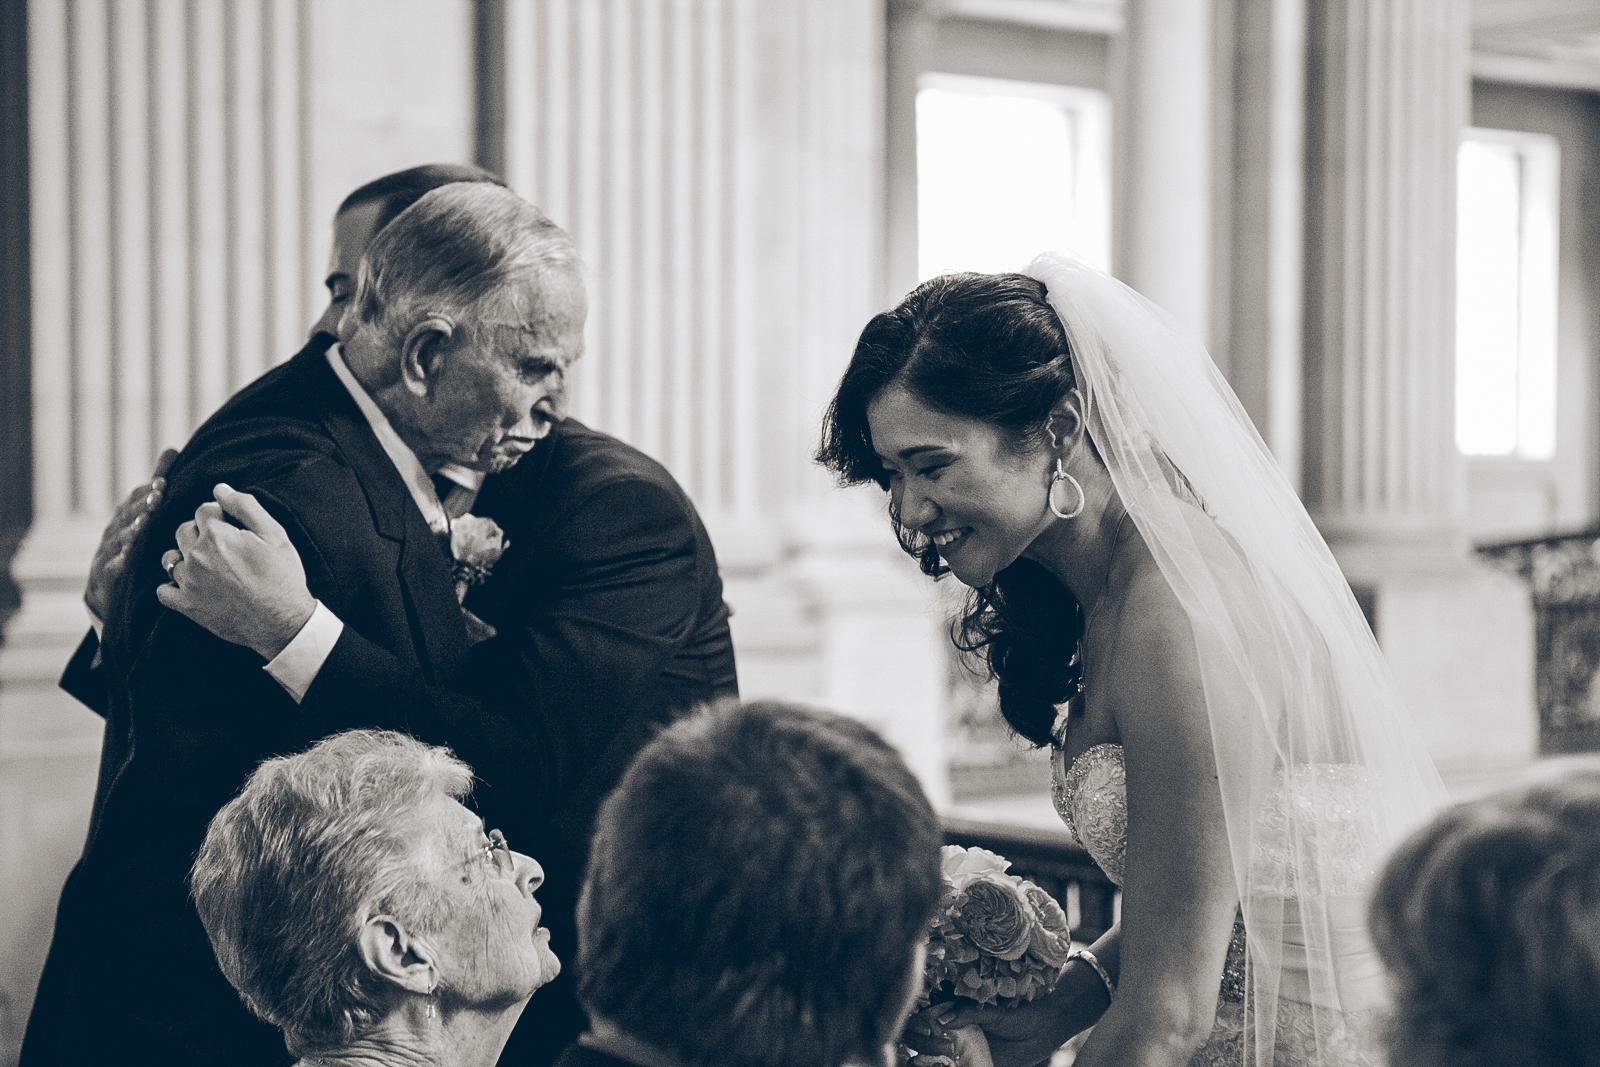 San_francisco_city_hall_wedding_photography_meegan_travis_ebony_siovhan_bokeh_photography_26.jpg